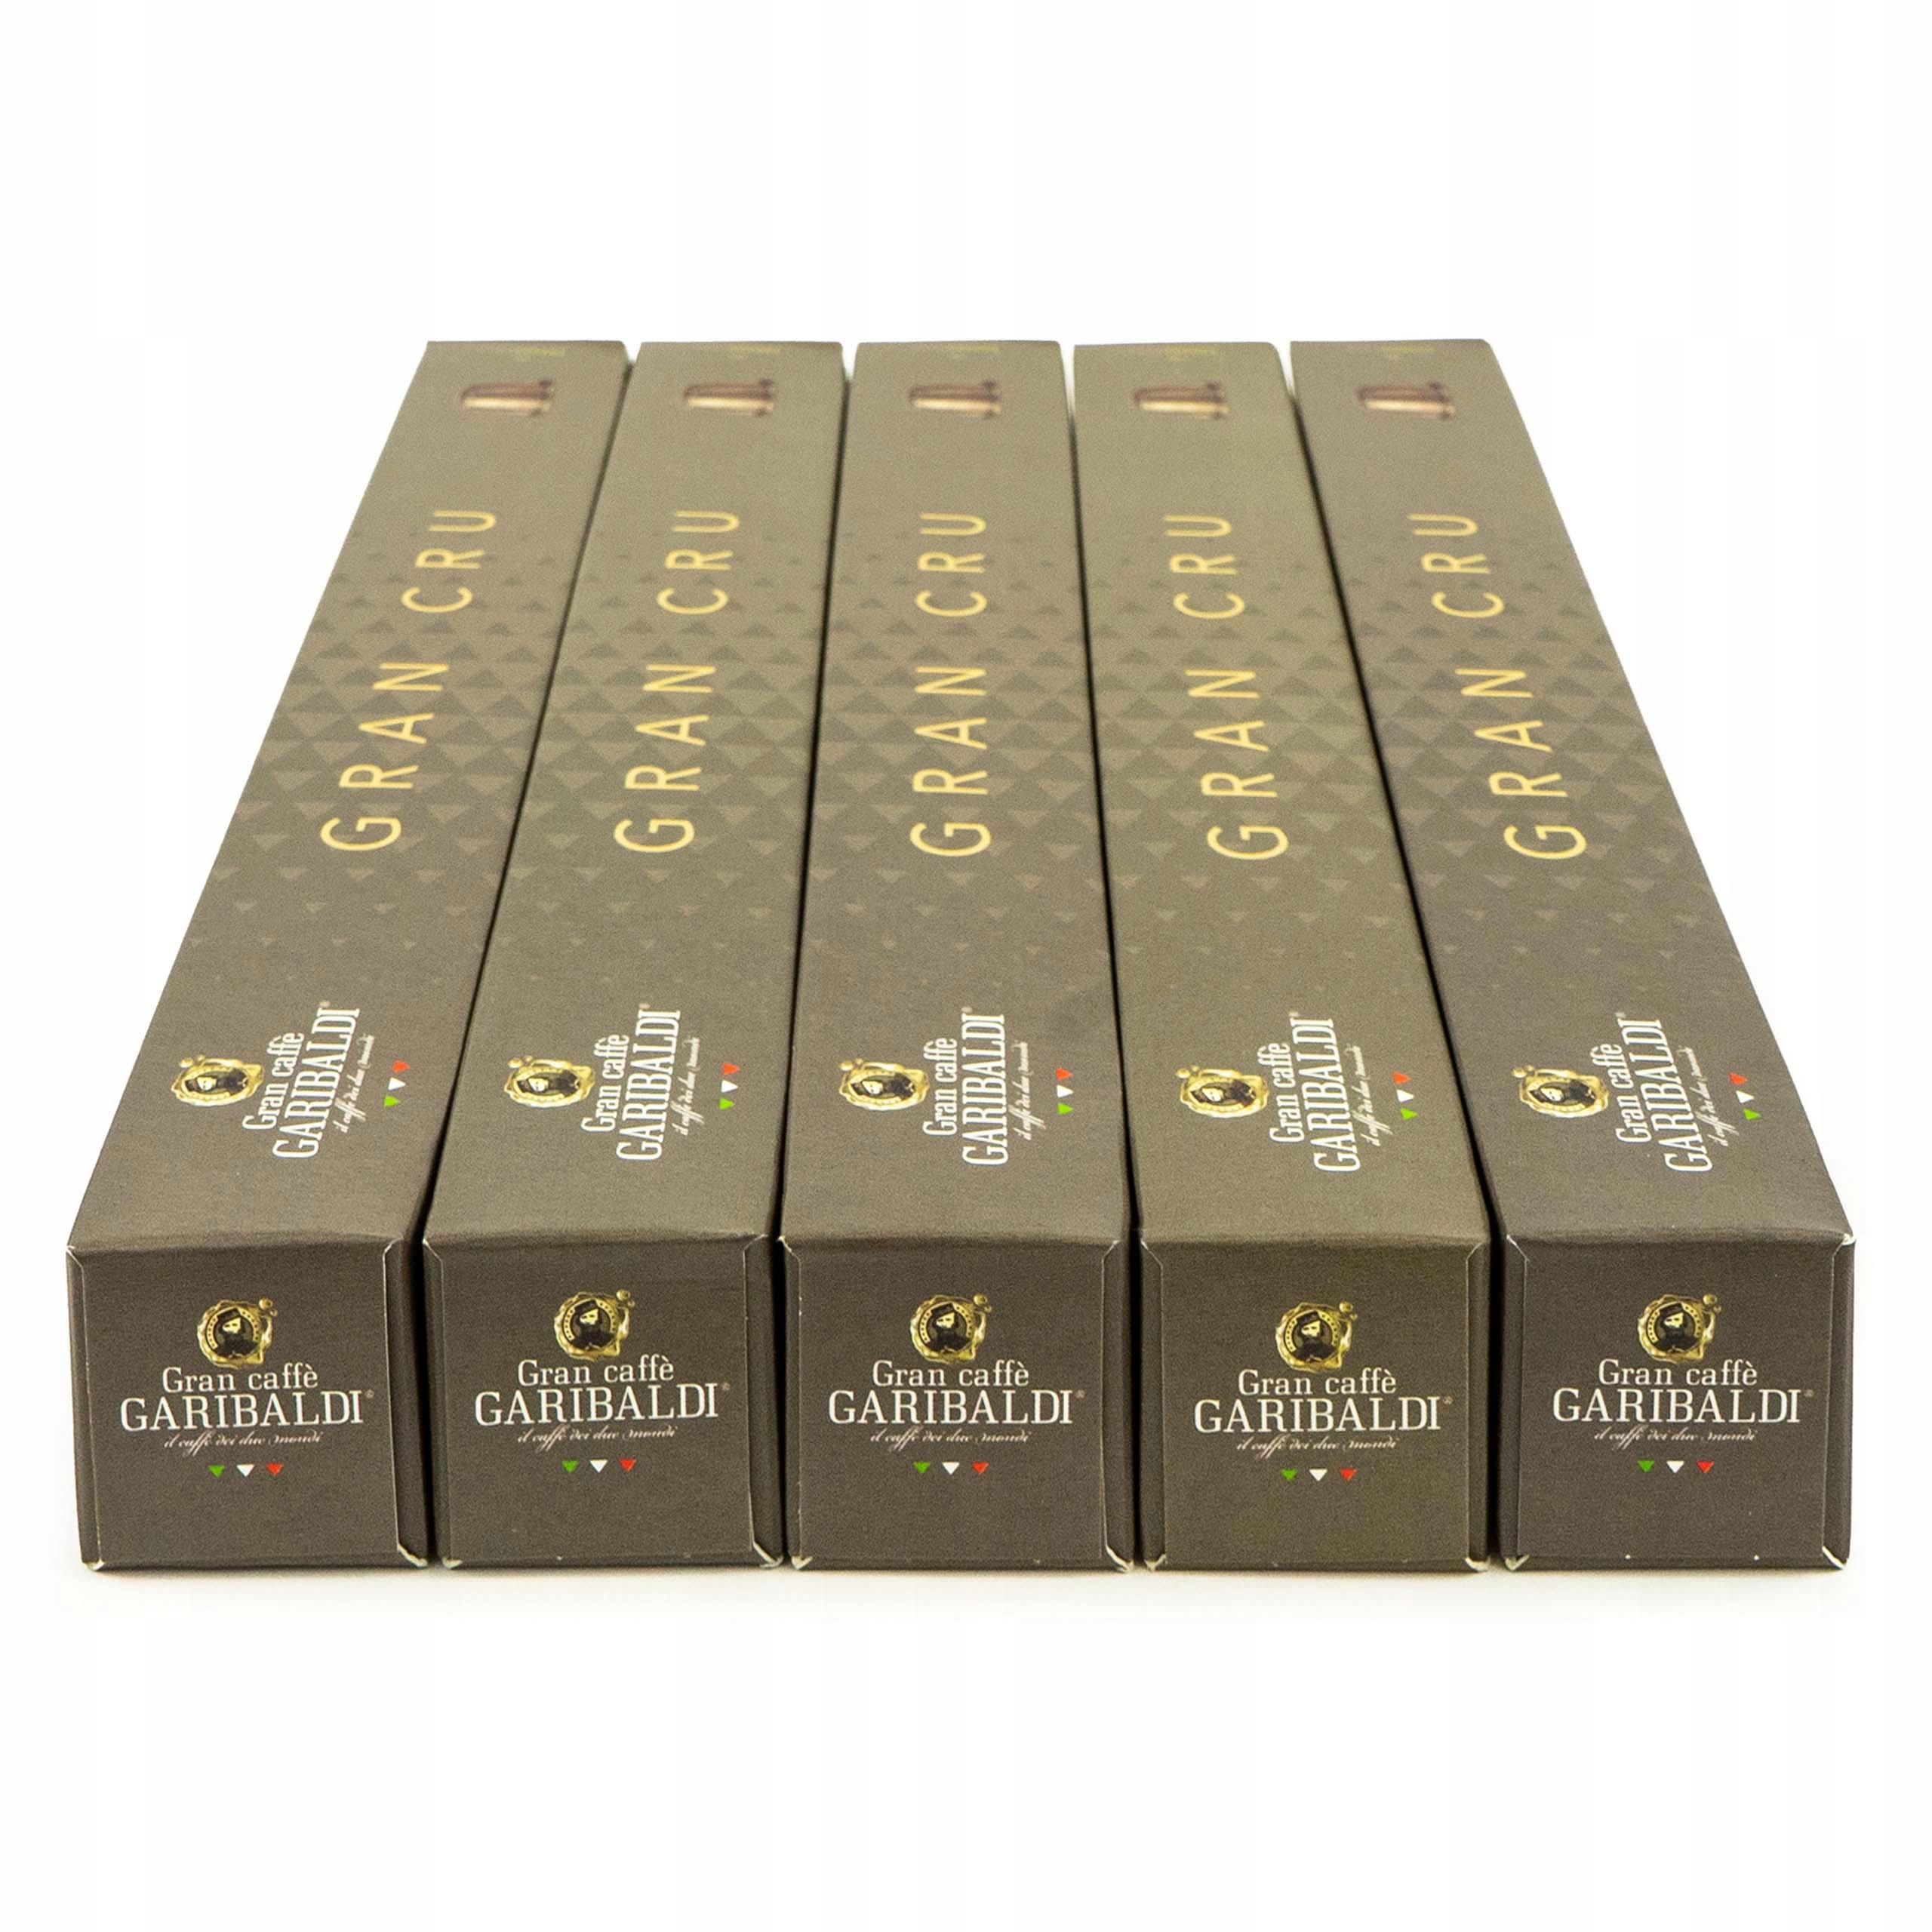 Kapsule Nespresso pre Arabica Garibaldi Taliansko 50sz